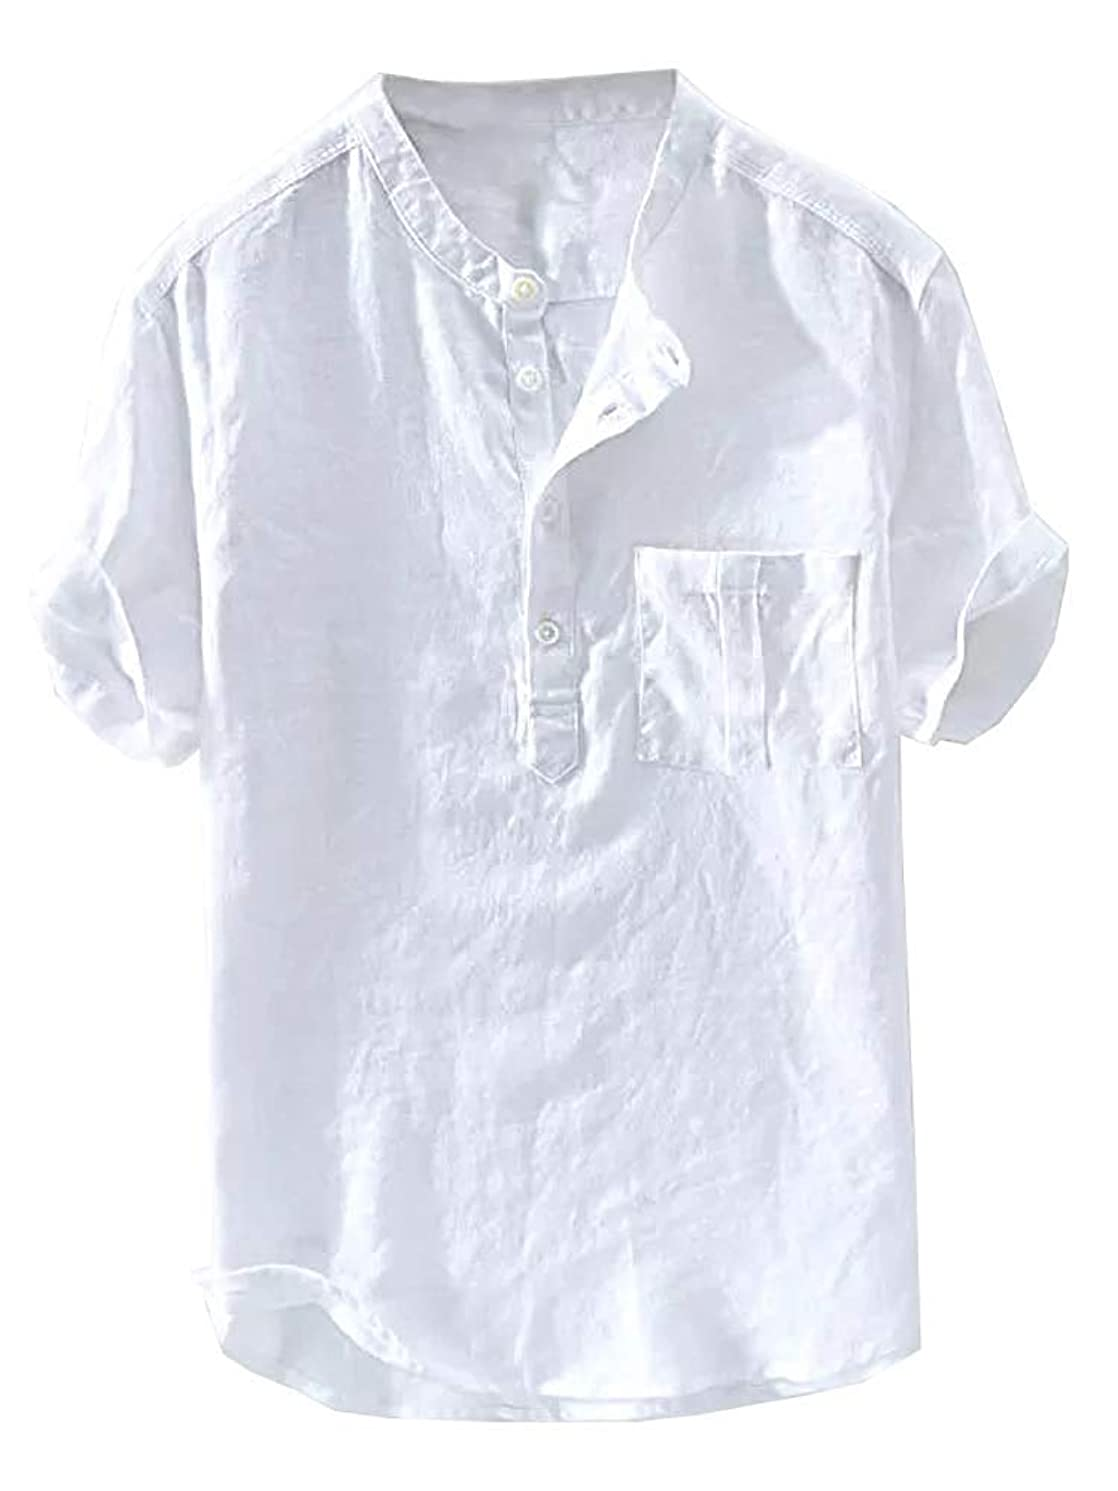 Beotyshow Mens Summer Linen Henley Shirt Mandarin Collar Retro Chinese Style Short Sleeve Tees Casual Shirts for Men